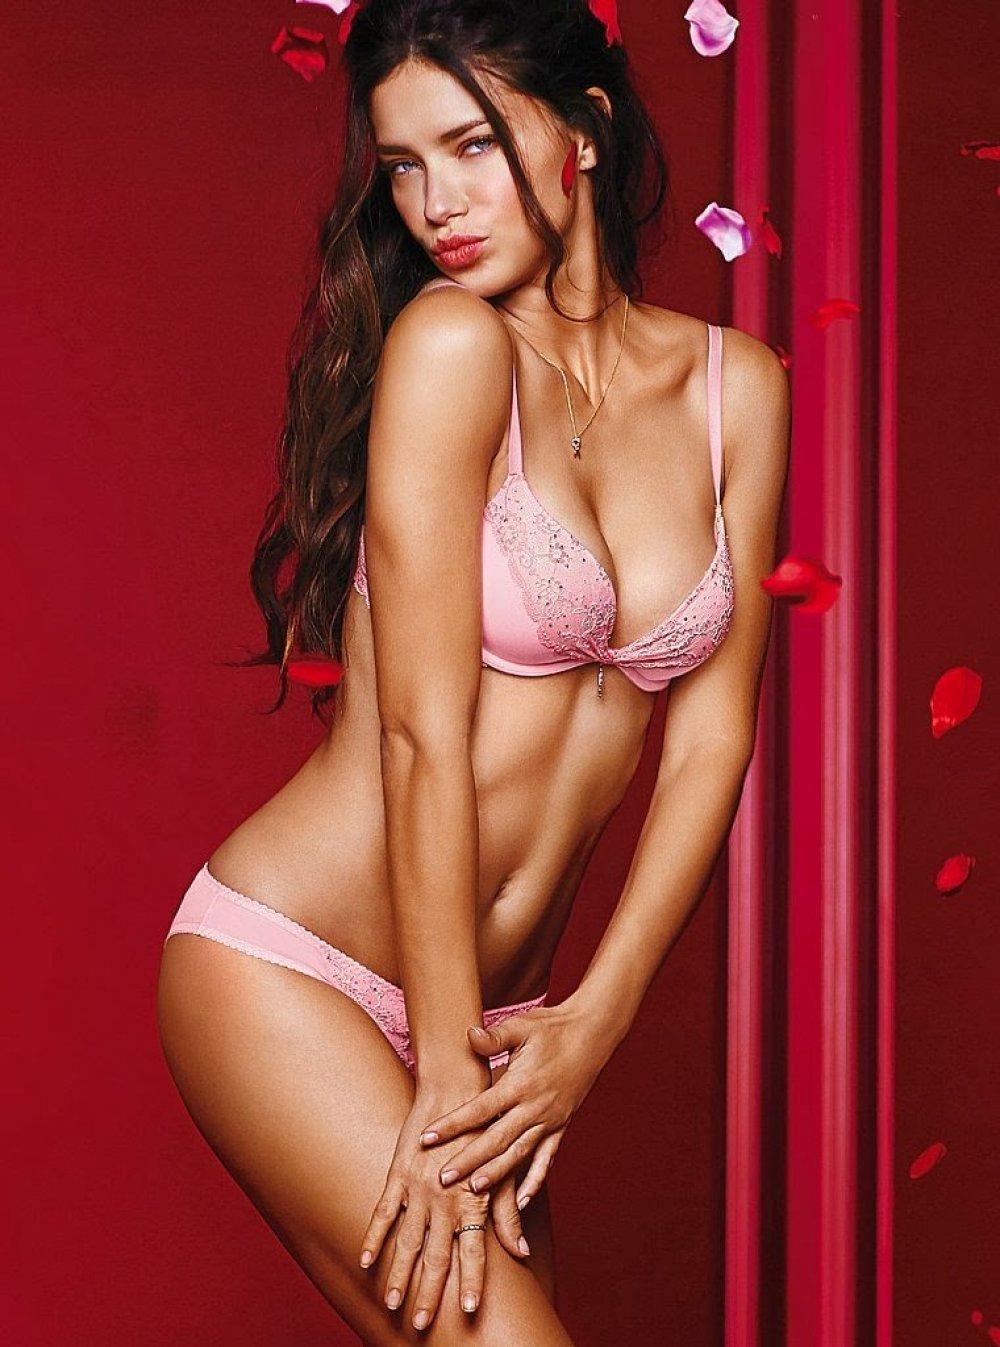 Секс с викторией валентино 19 фотография